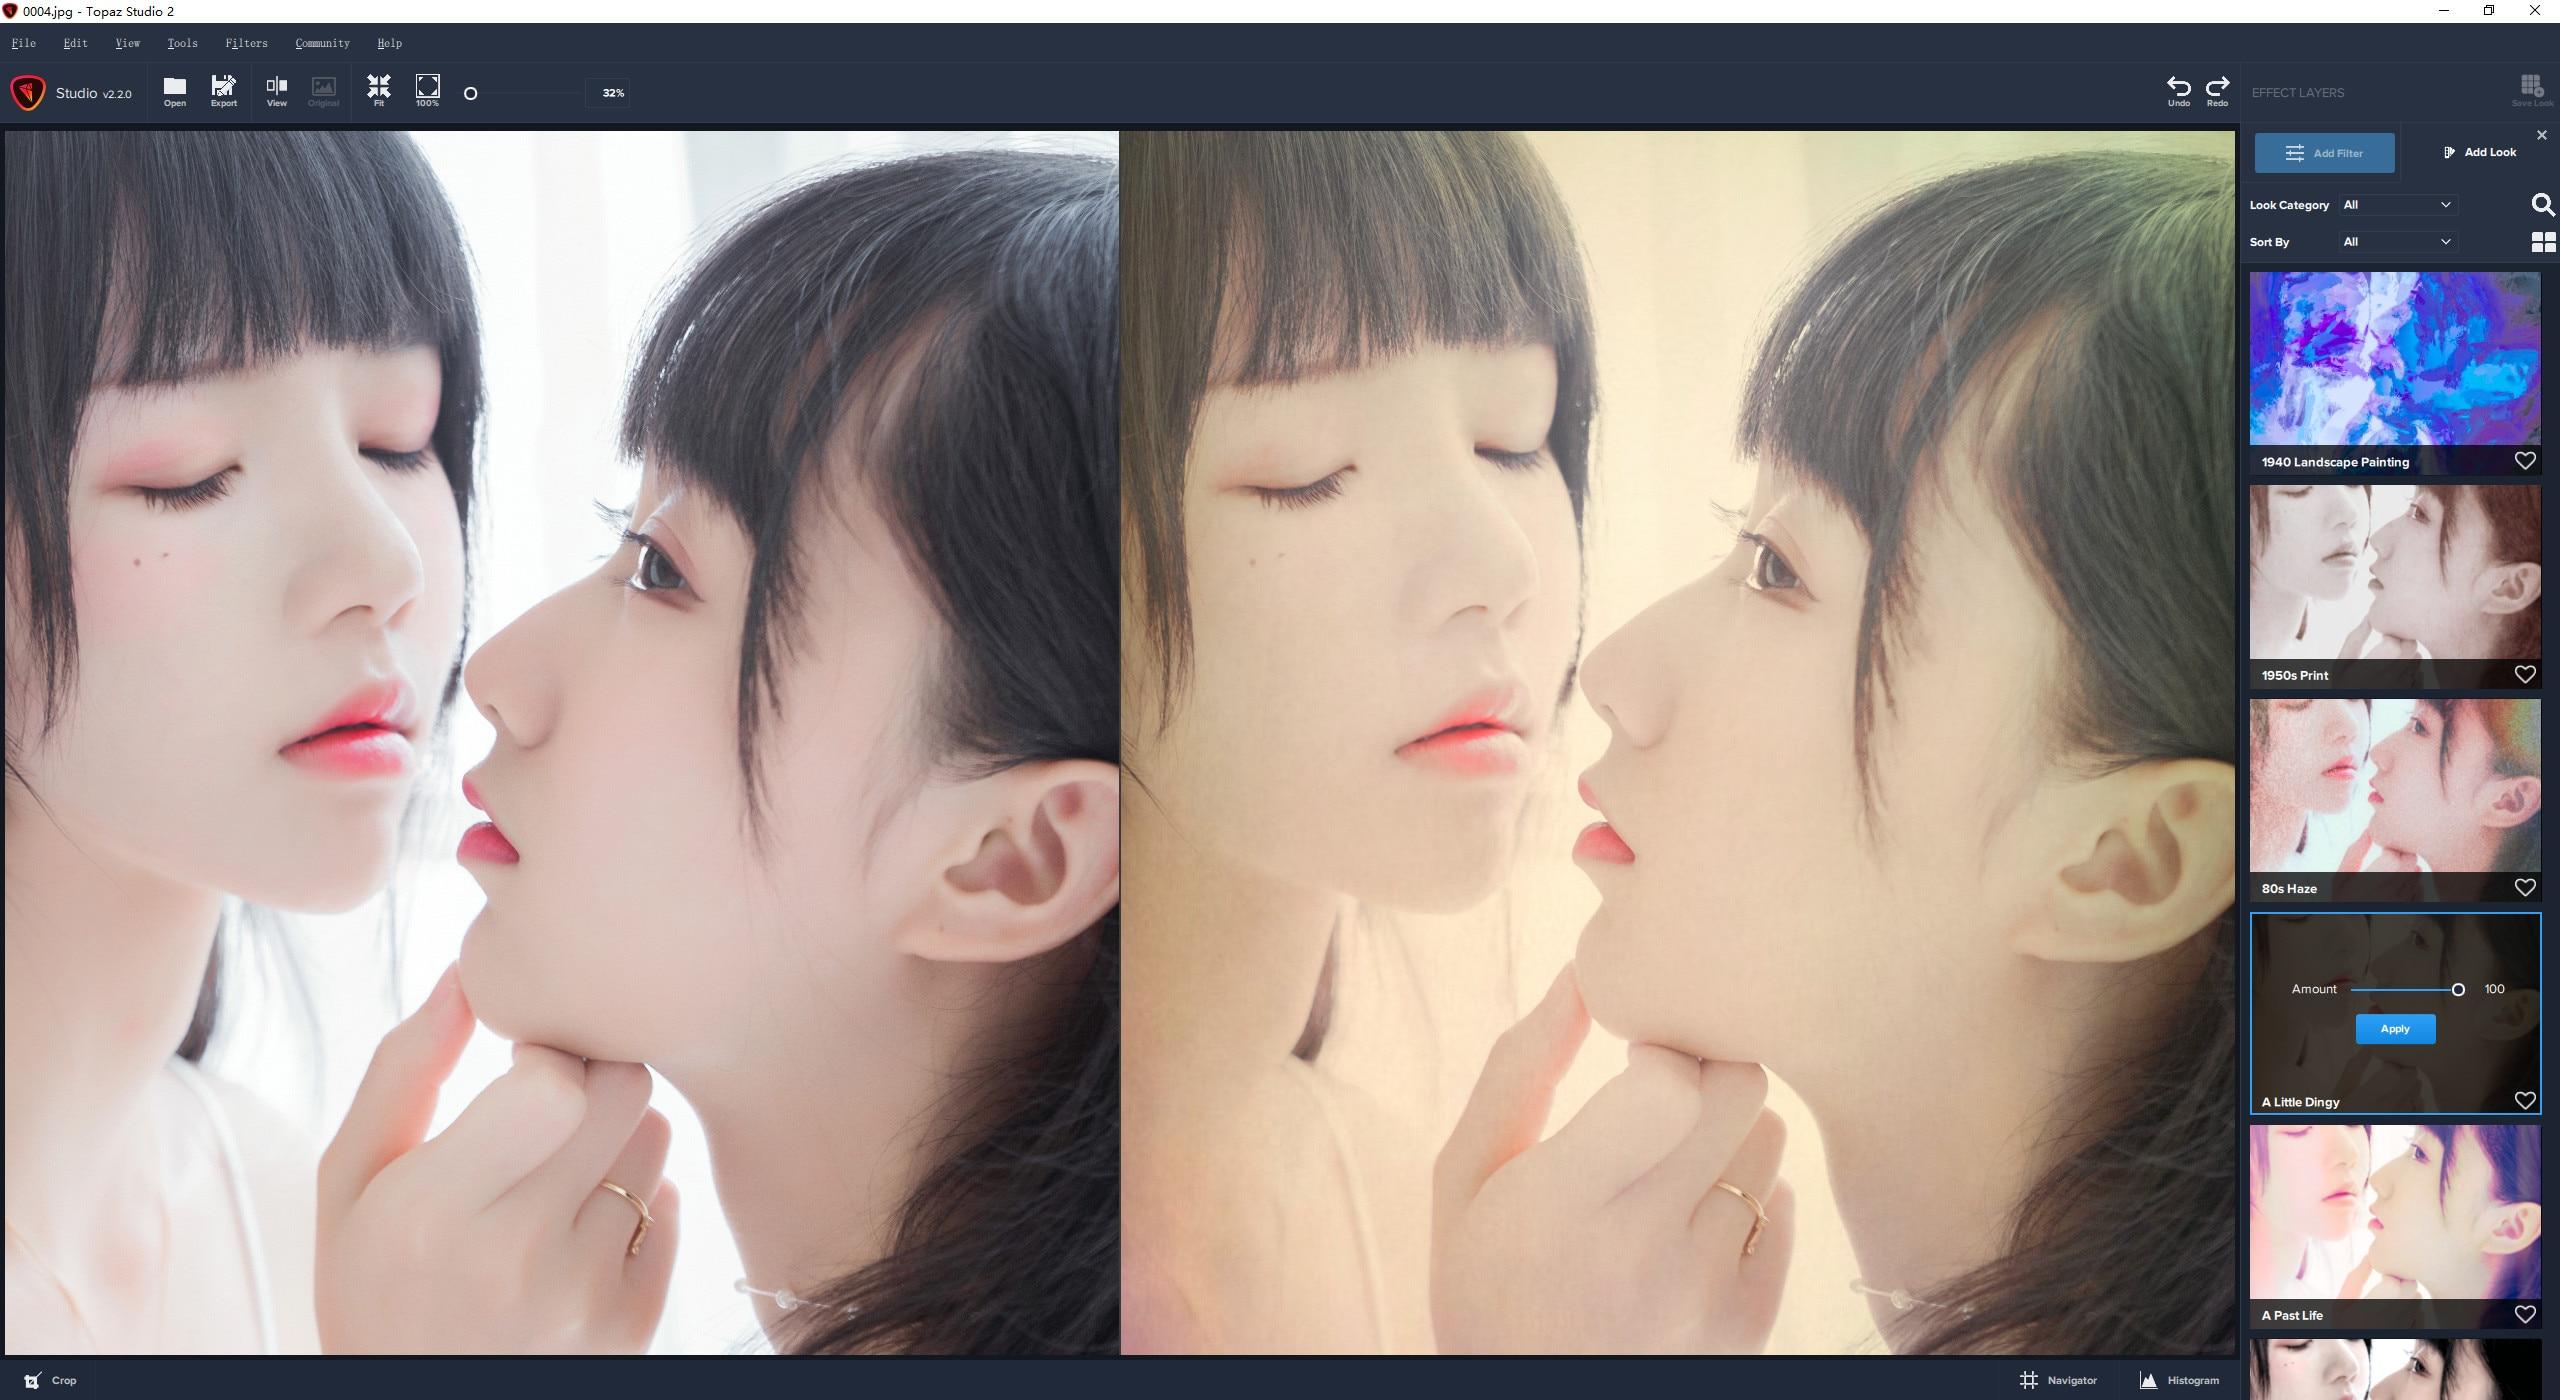 VIP资源-创意照片编辑软件 Topaz Studio 2.3.2 WIN 中文汉化版(5)